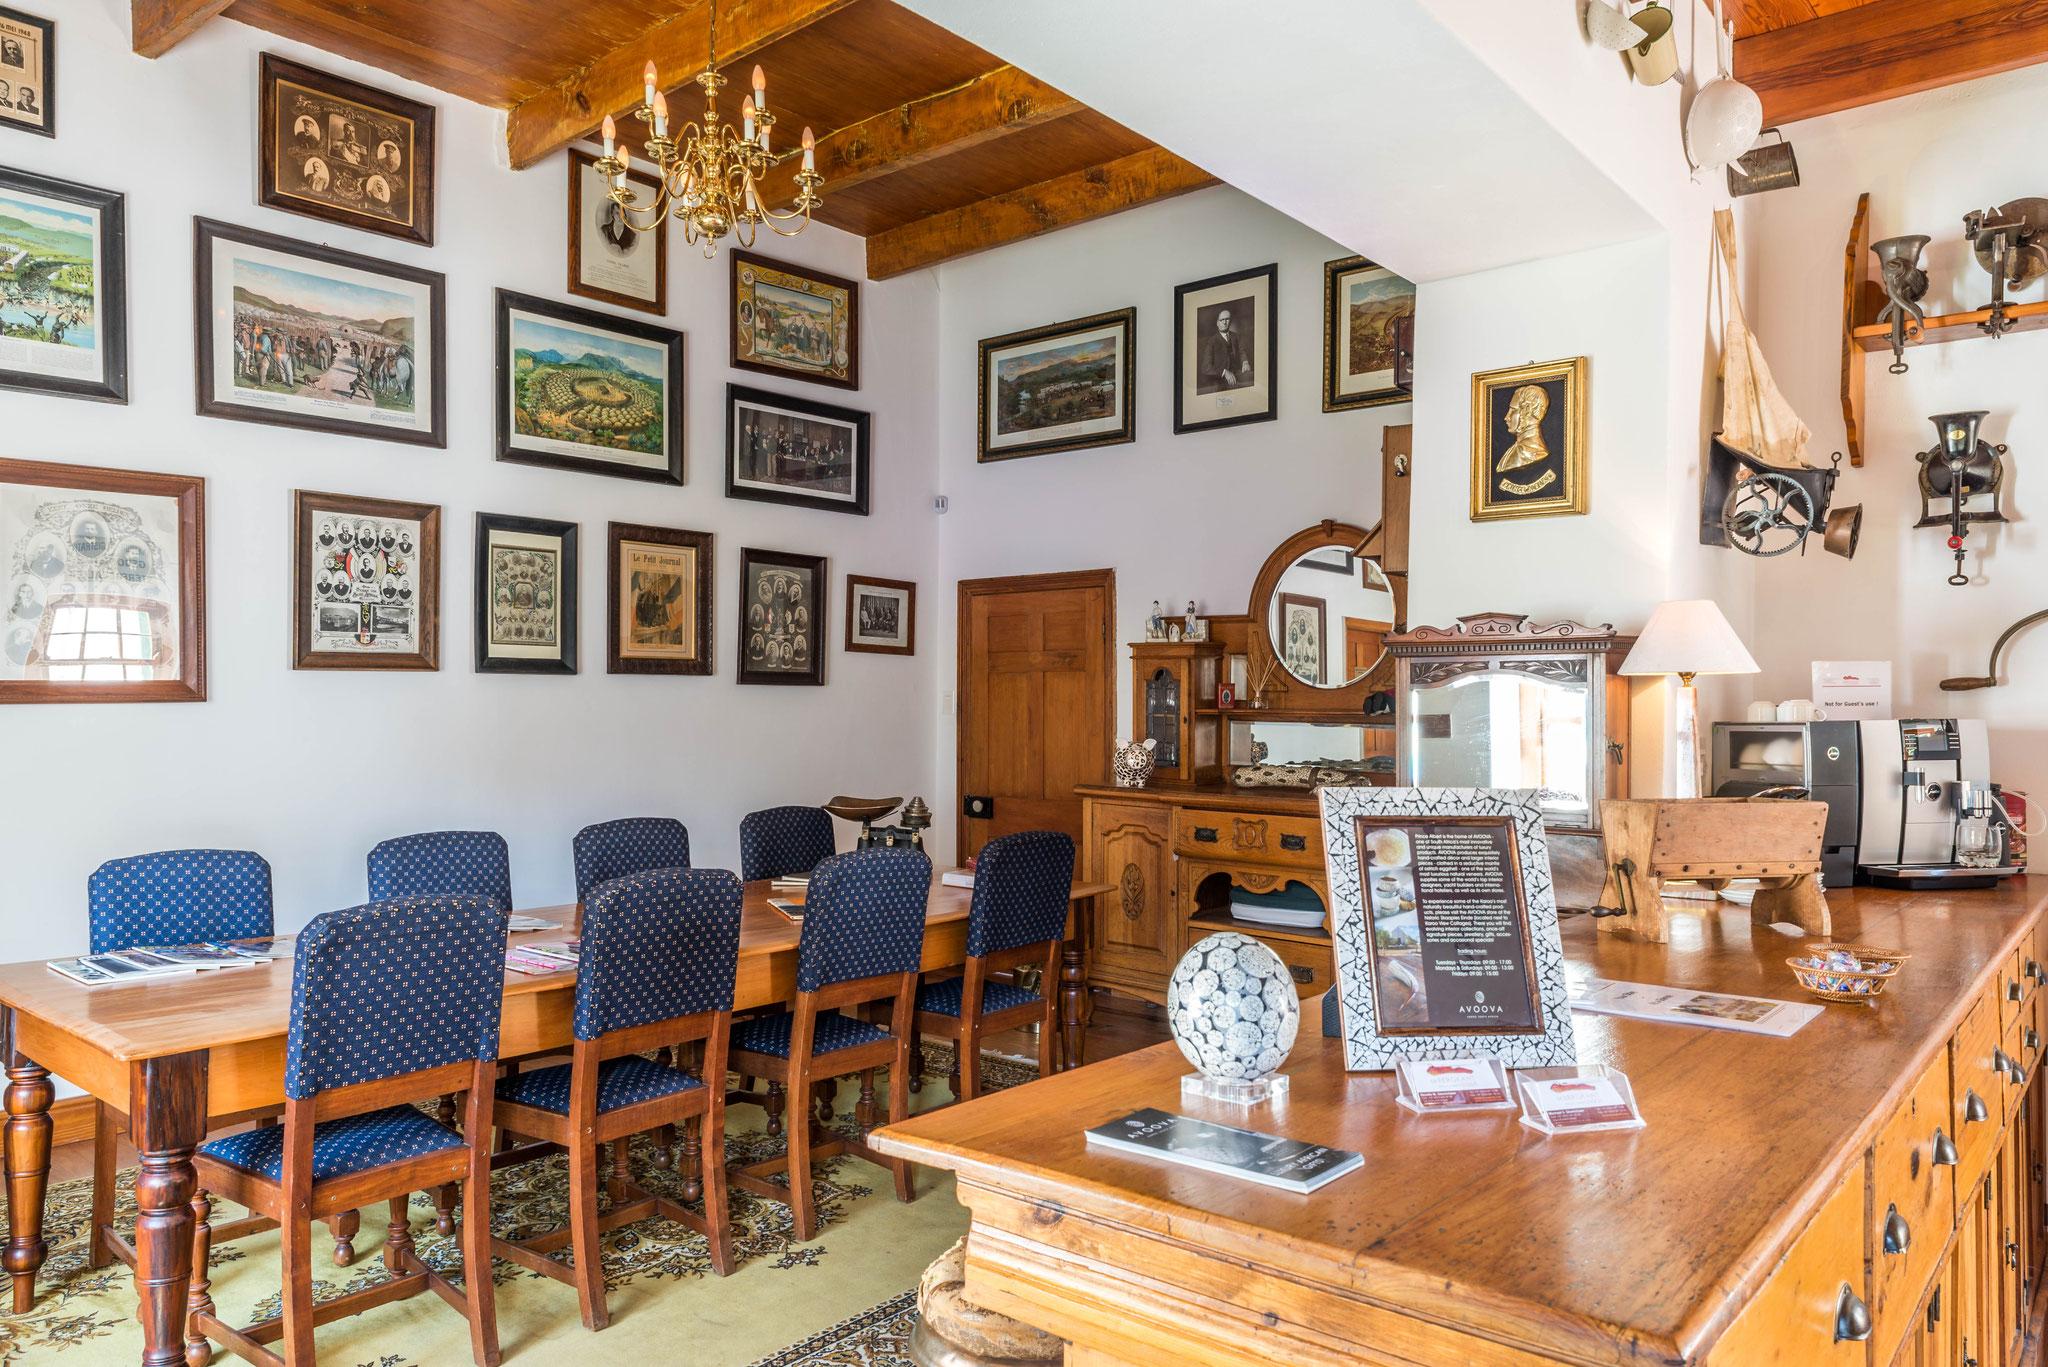 Manor House from 1858 - Monument nationales: Lobby & réception de l'hôtel